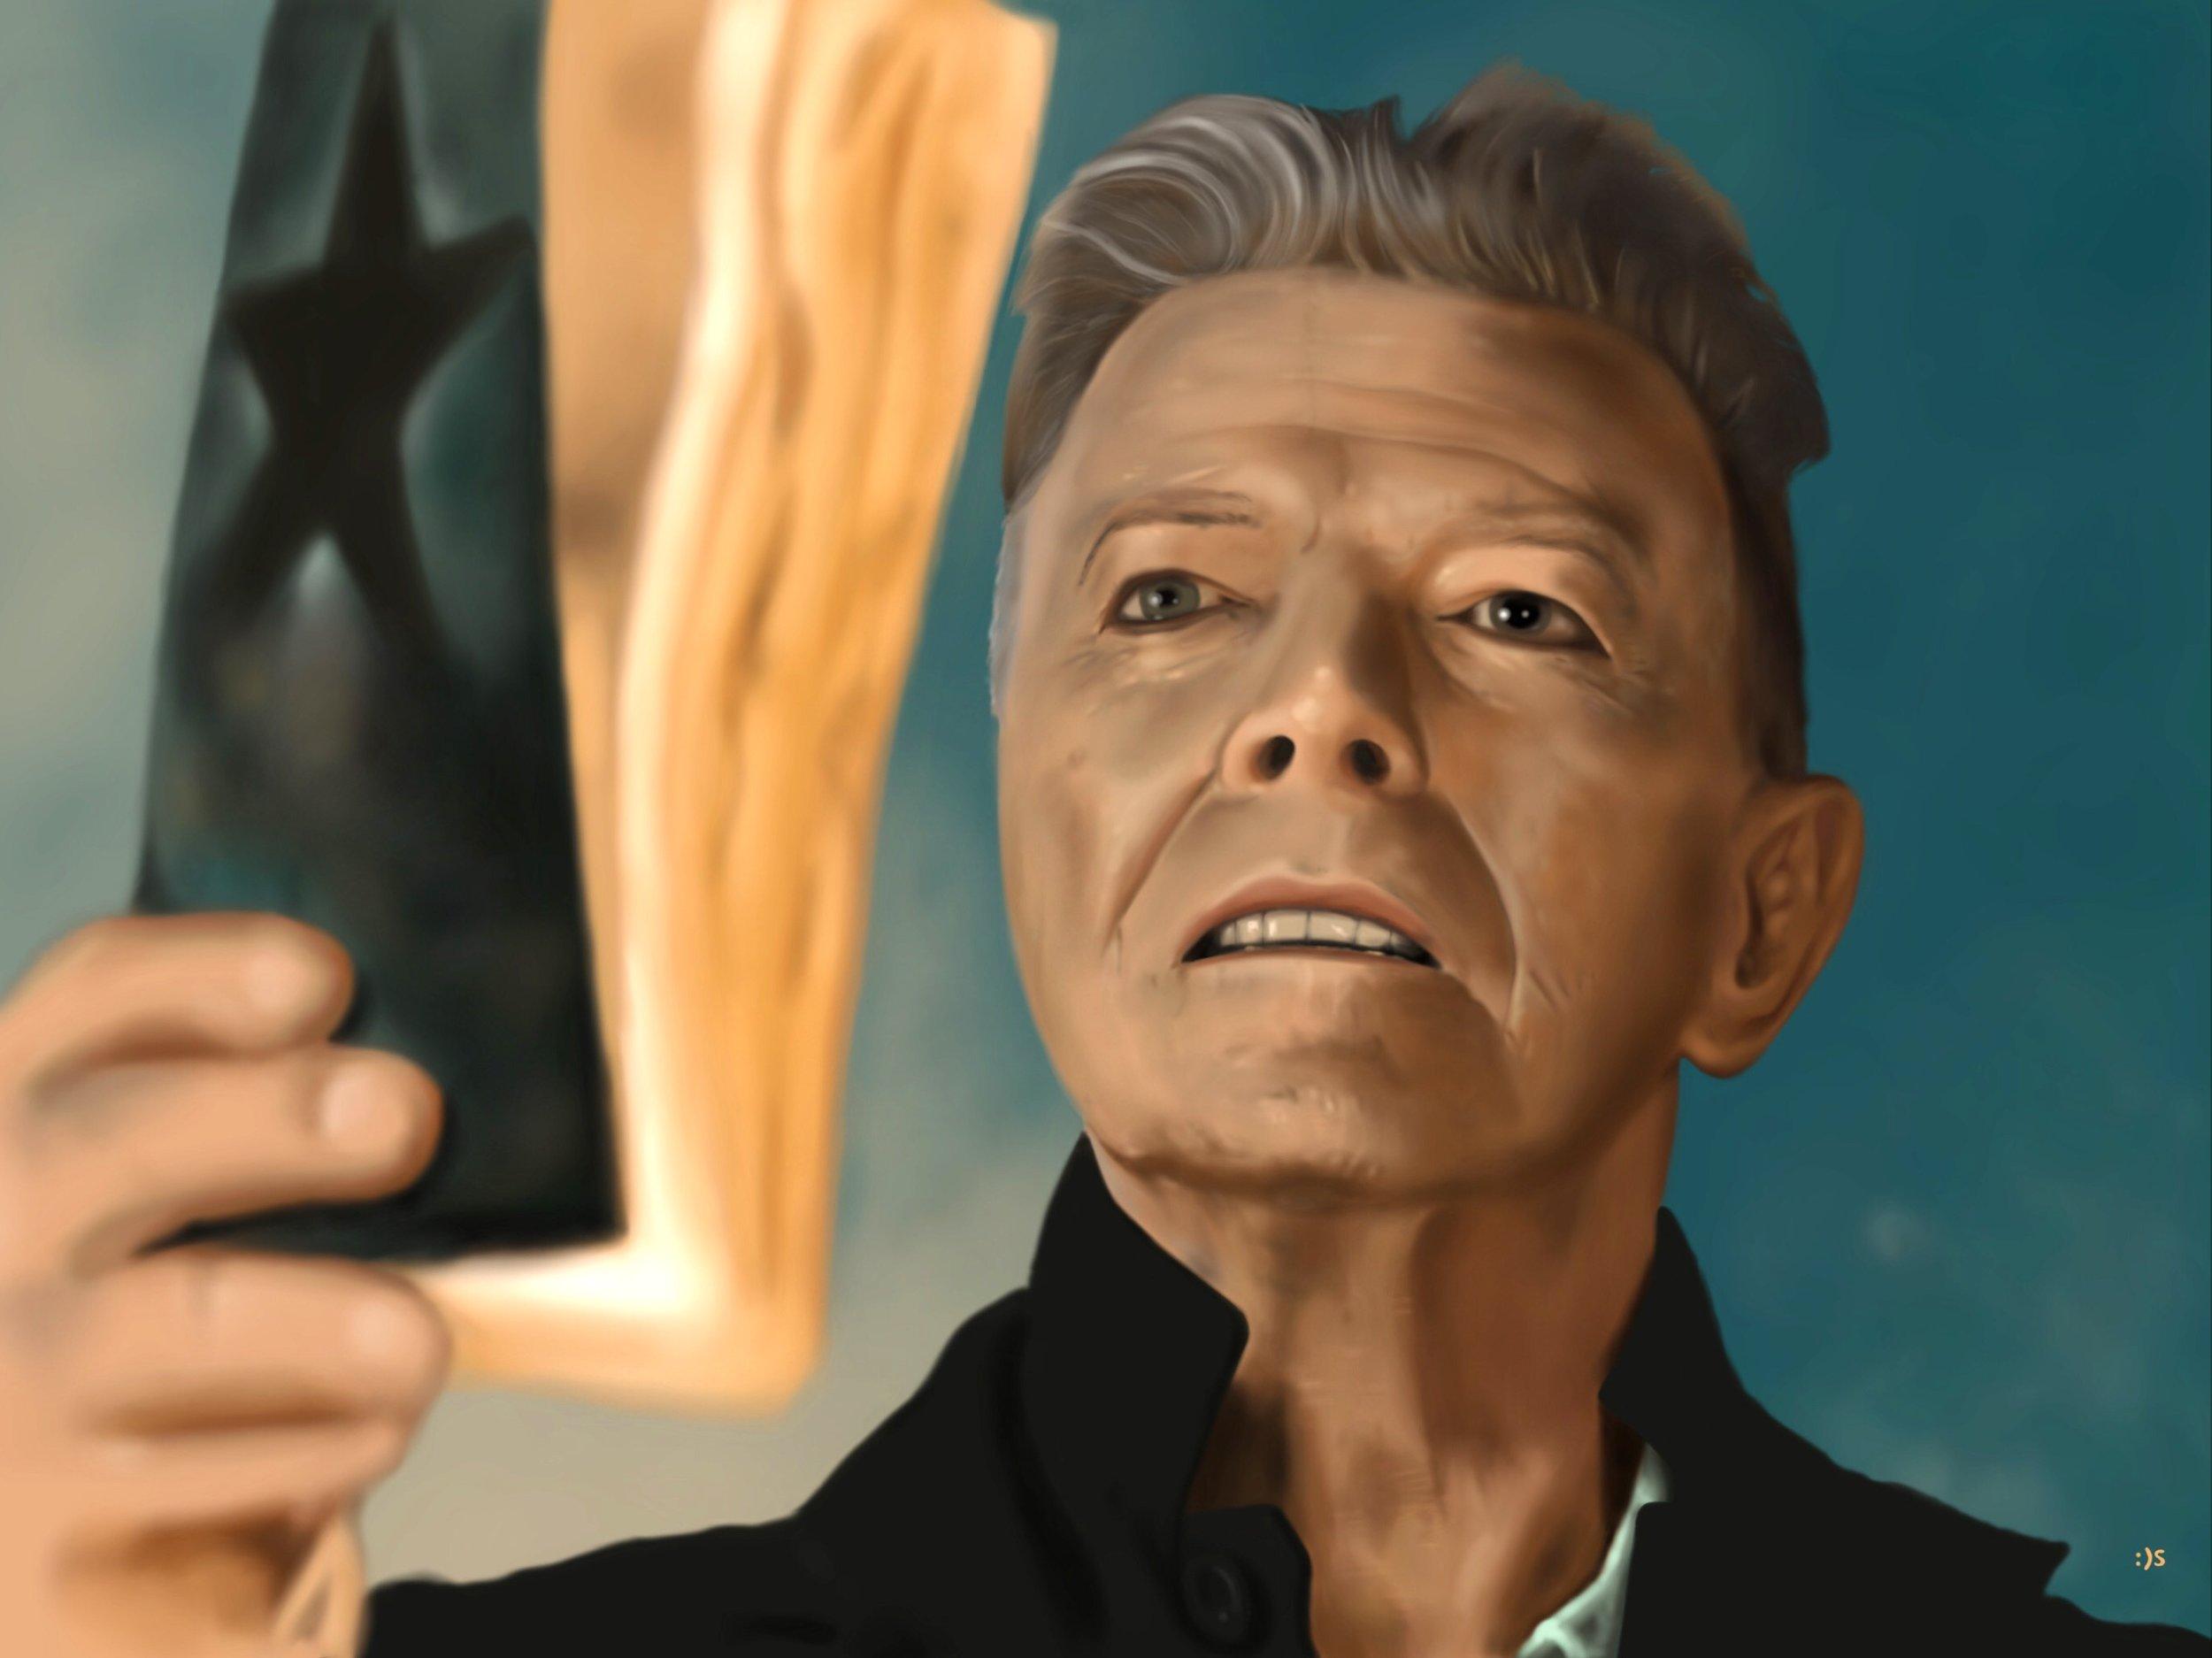 Bowie_-_Blackstar_final.jpg